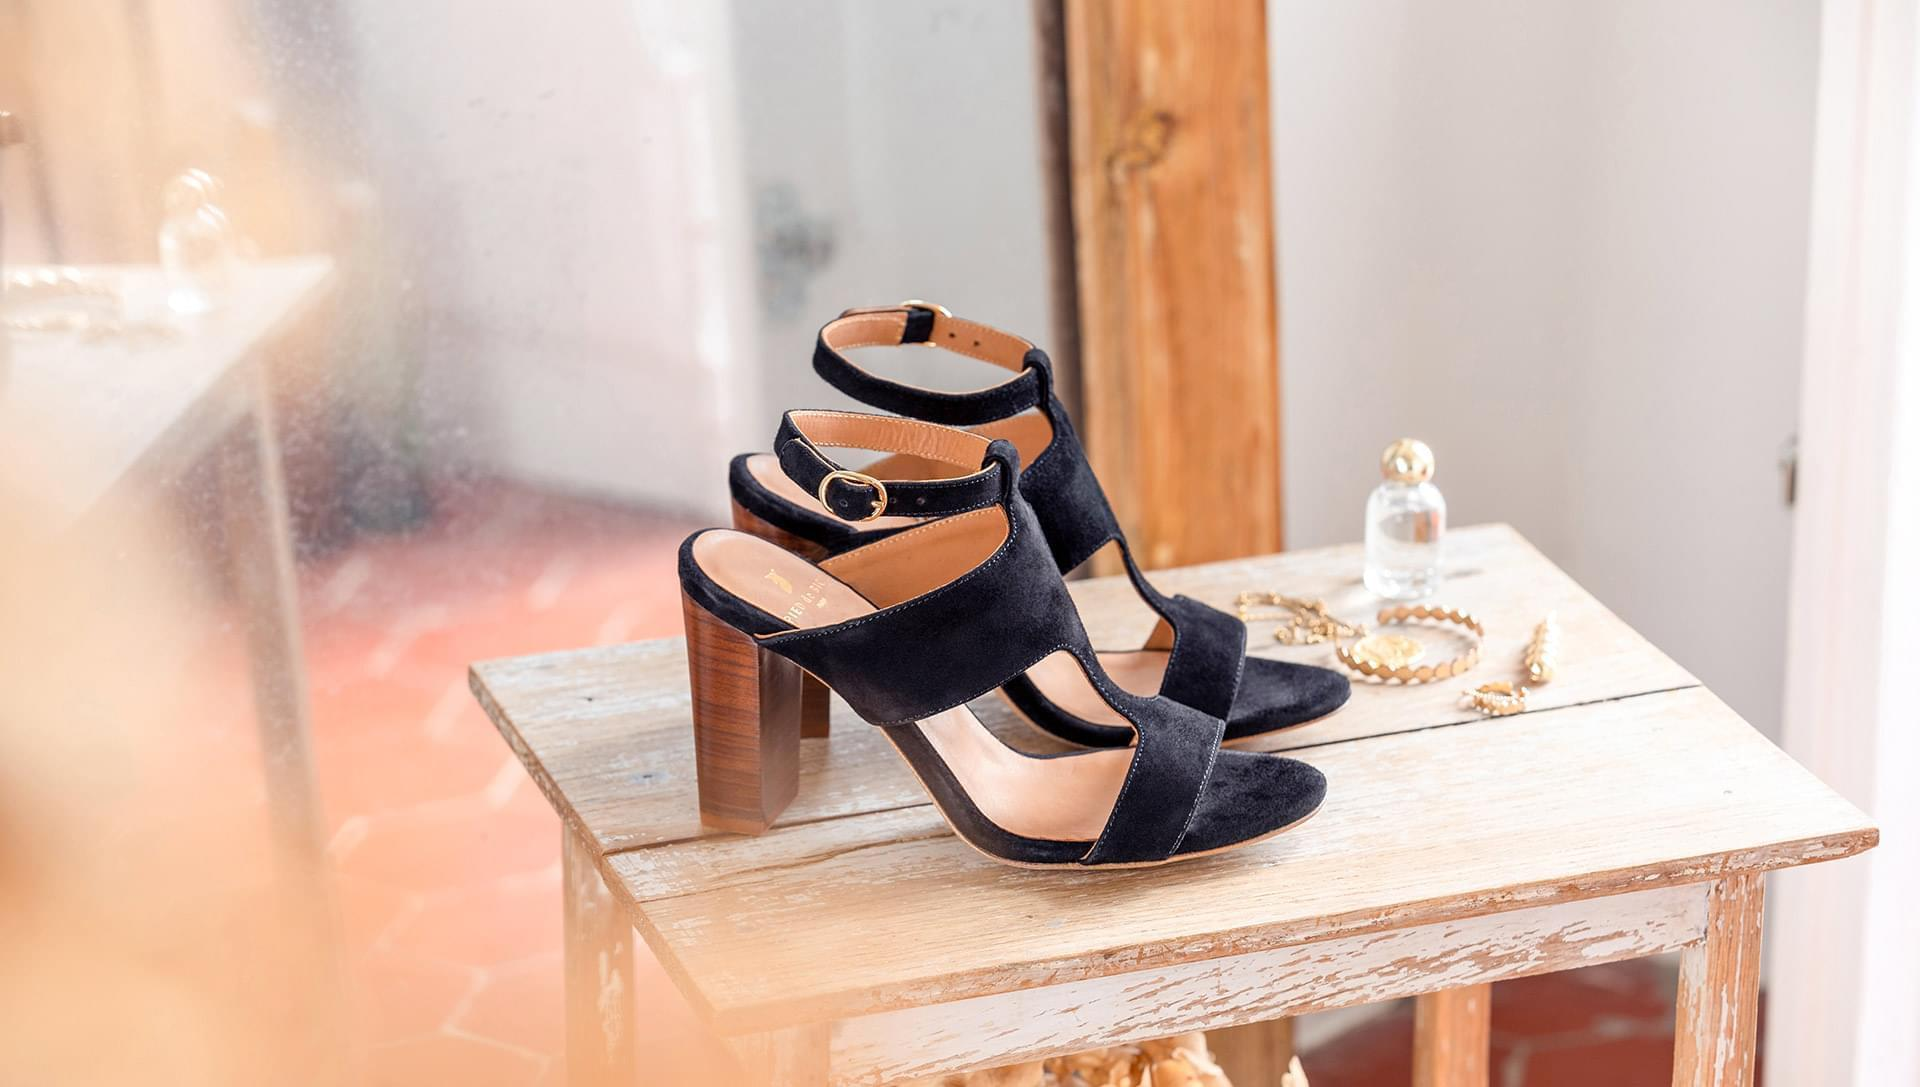 Gabie heeled sandals - Black